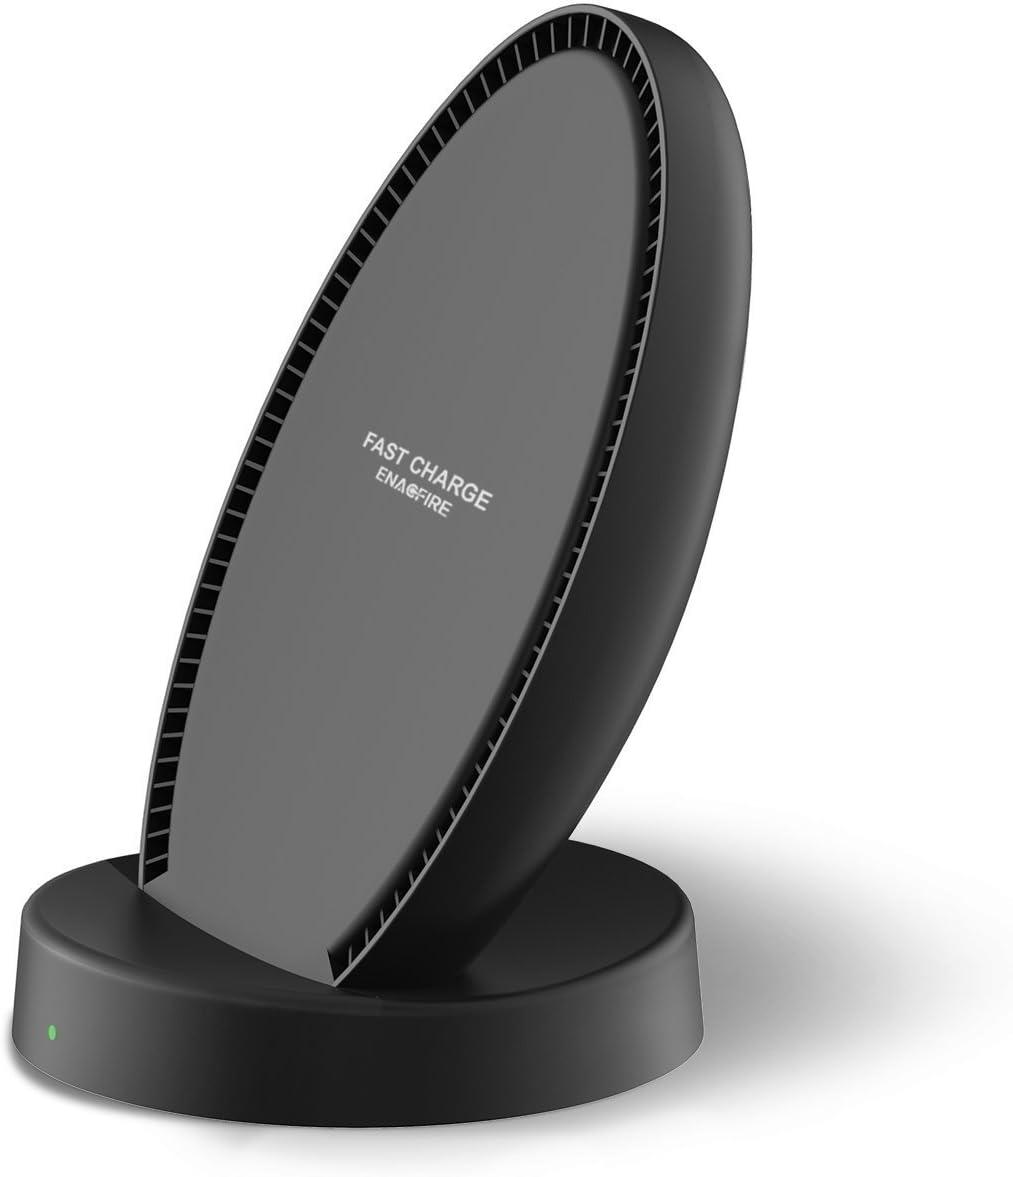 iPhone X Wireless Charger ENACFIRE W2 Standard Qi Wireless Charger for iPhone X 8 8 Plus No AC Adapter Fast Wireless Charger Pad Stand for Samsung Galaxy Note 8//5 S8//S8 Plus S7//S7 Edge S6 Edge Plus